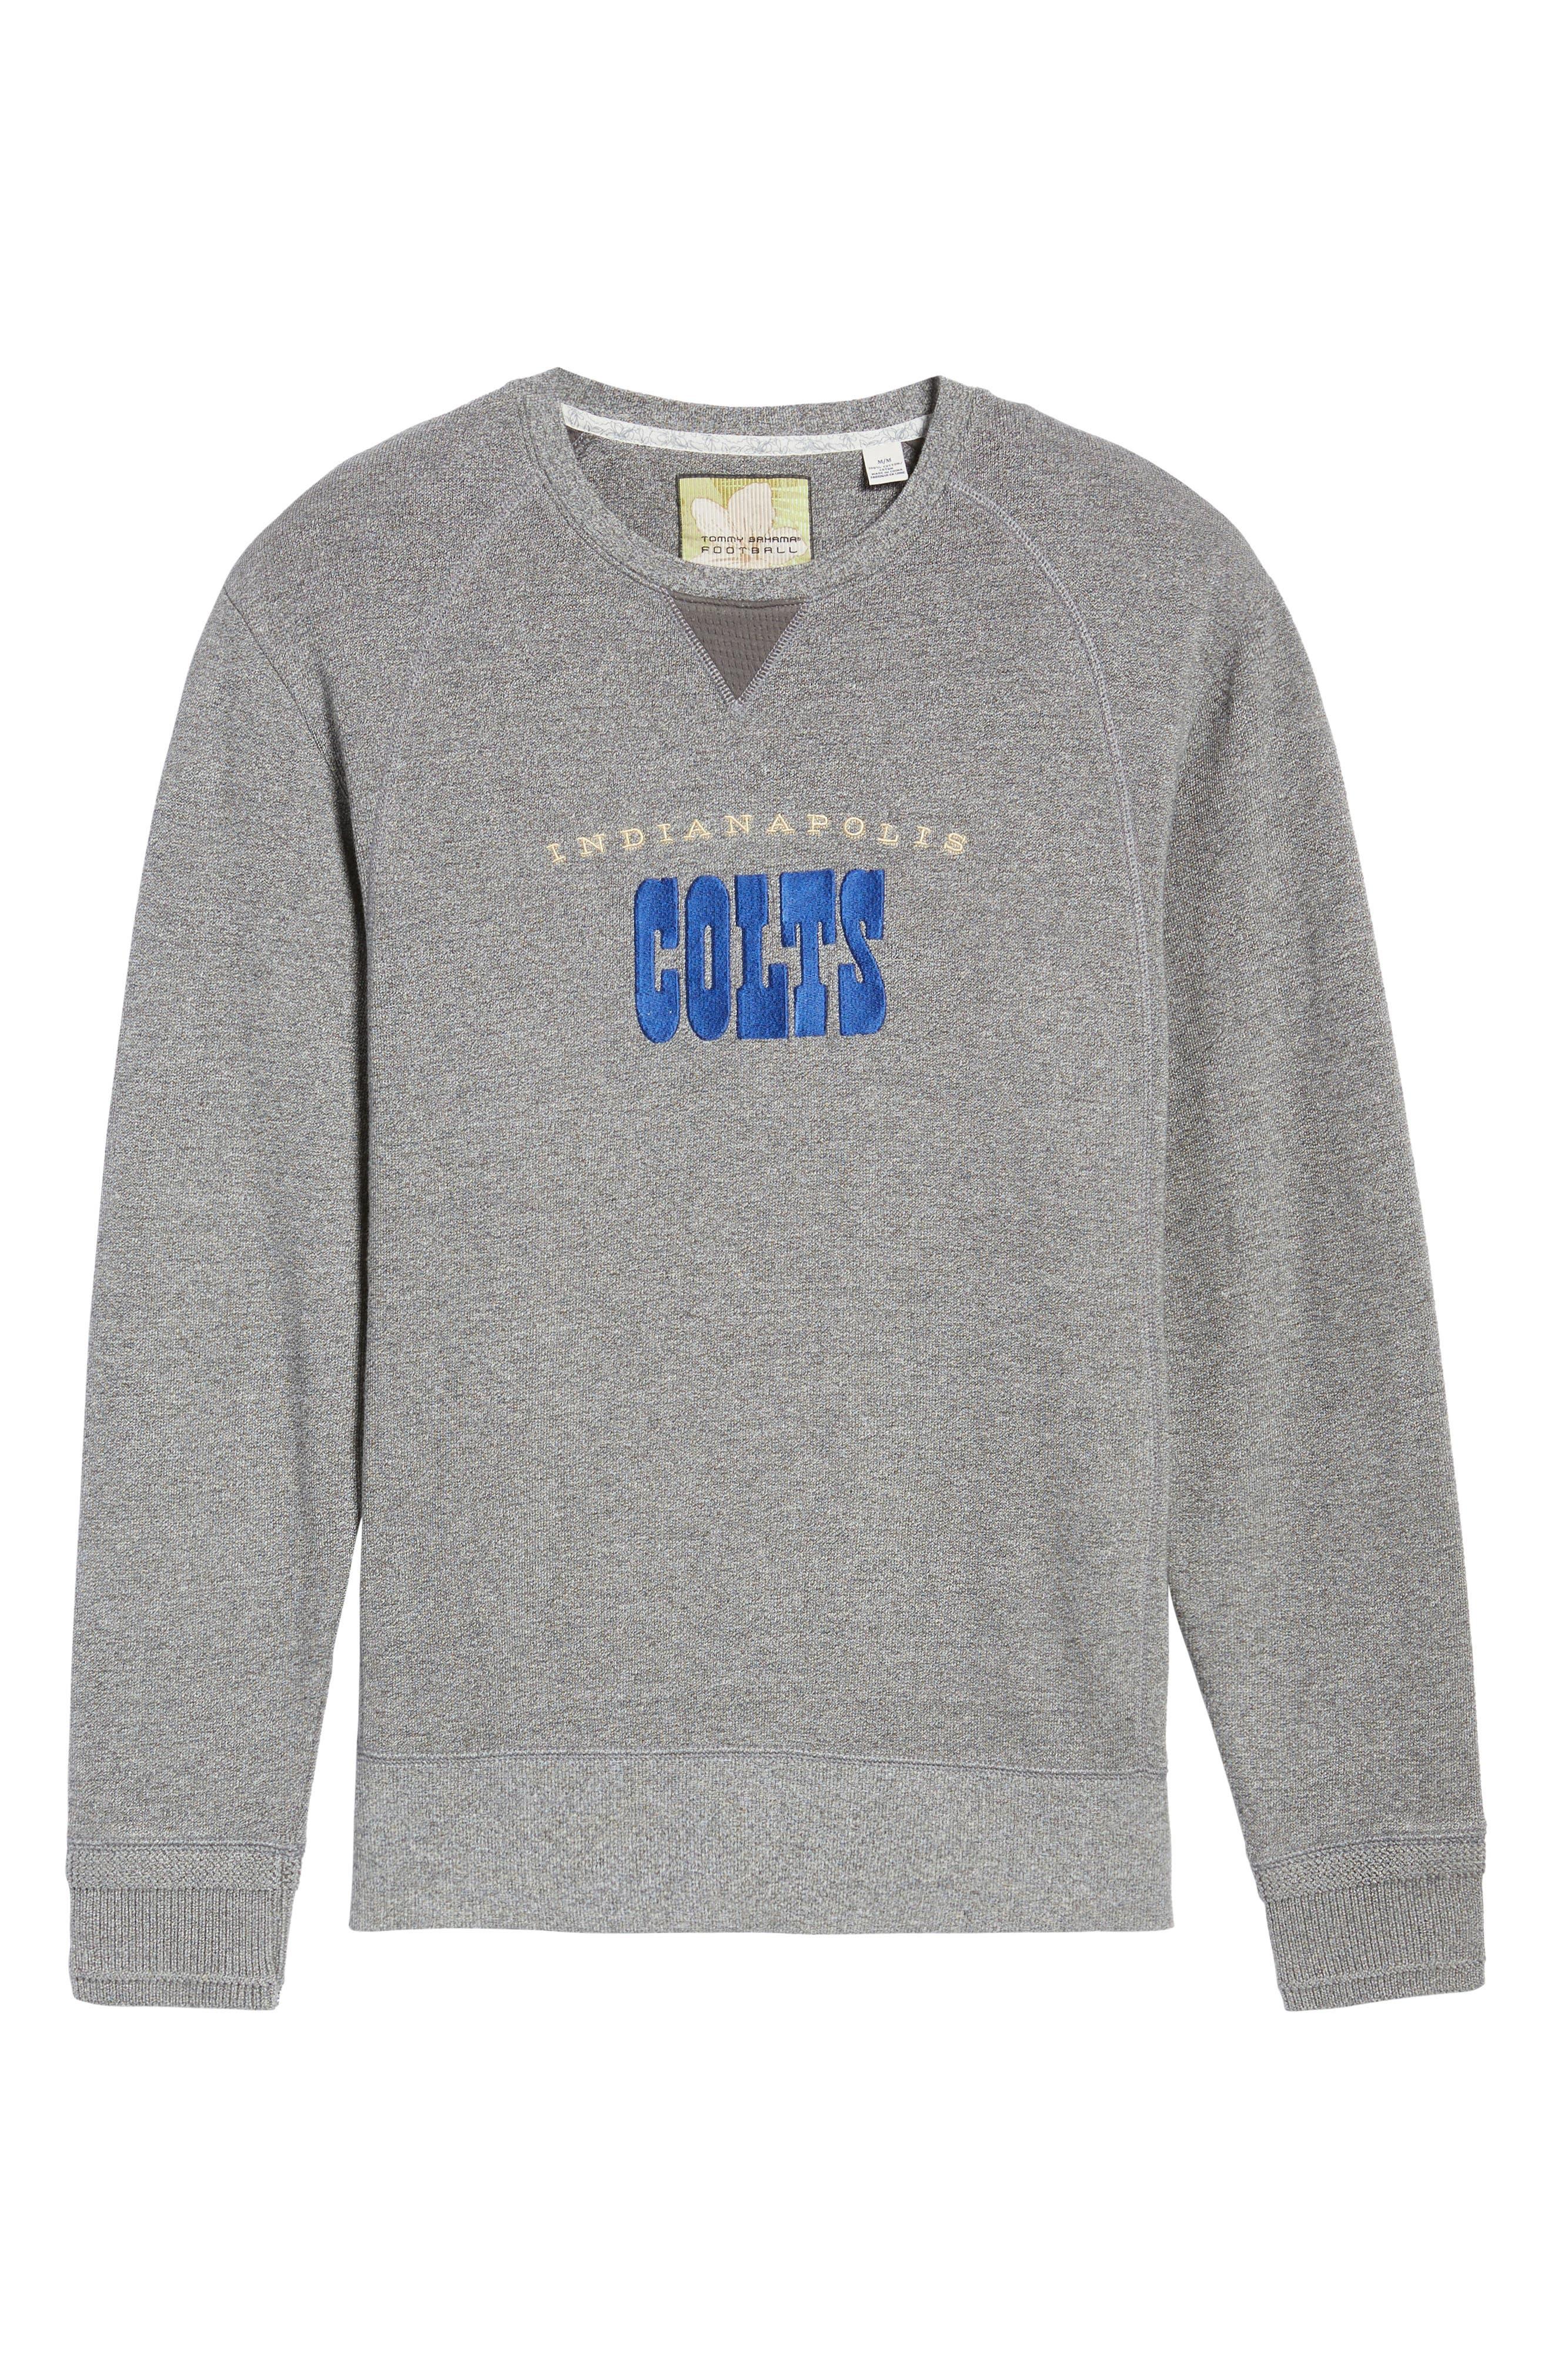 NFL Stitch of Liberty Embroidered Crewneck Sweatshirt,                             Alternate thumbnail 163, color,